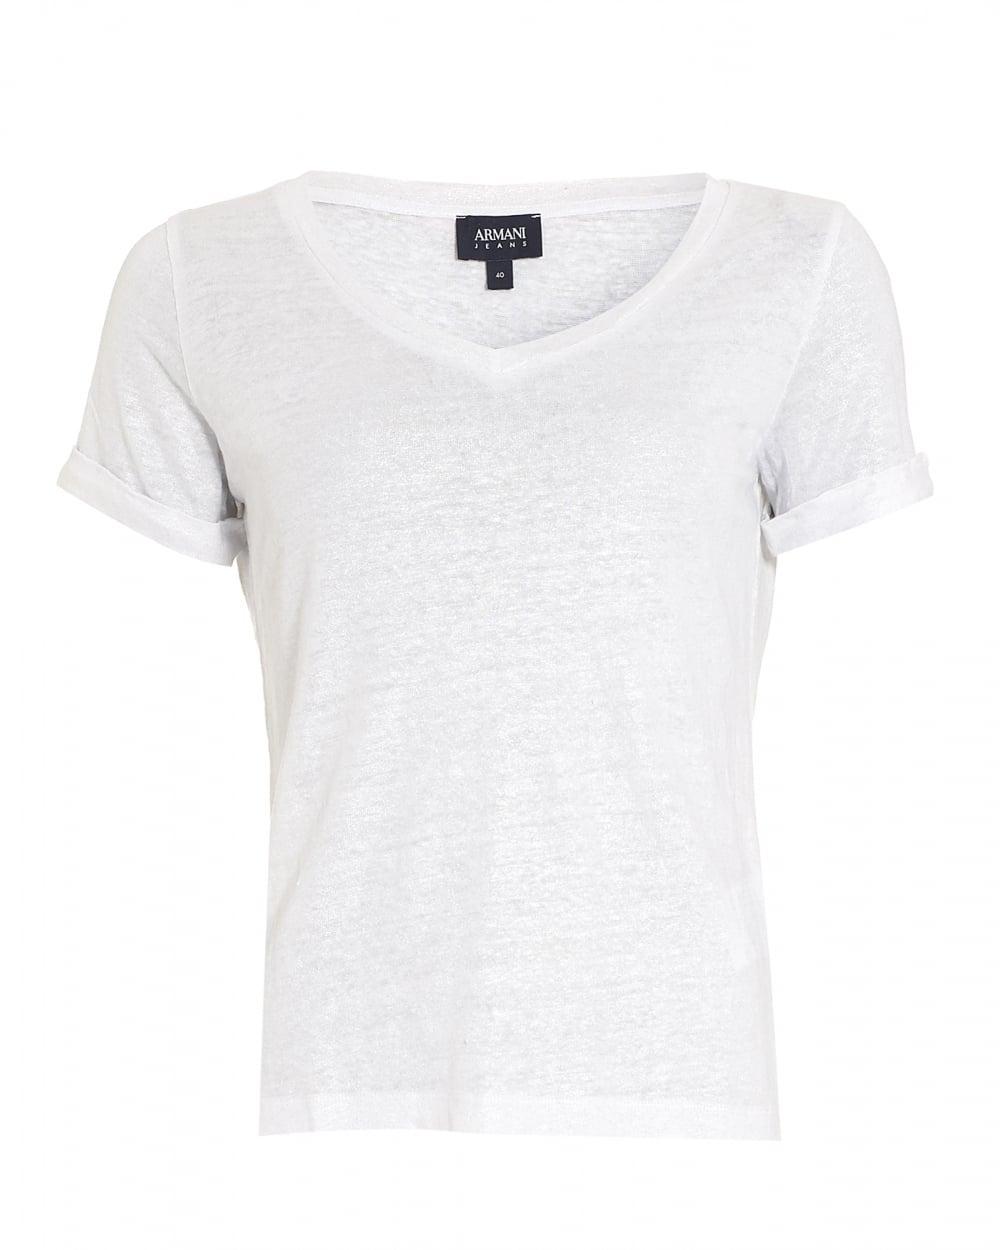 Armani Jeans Womens T Shirt V Neck Linen White Tee